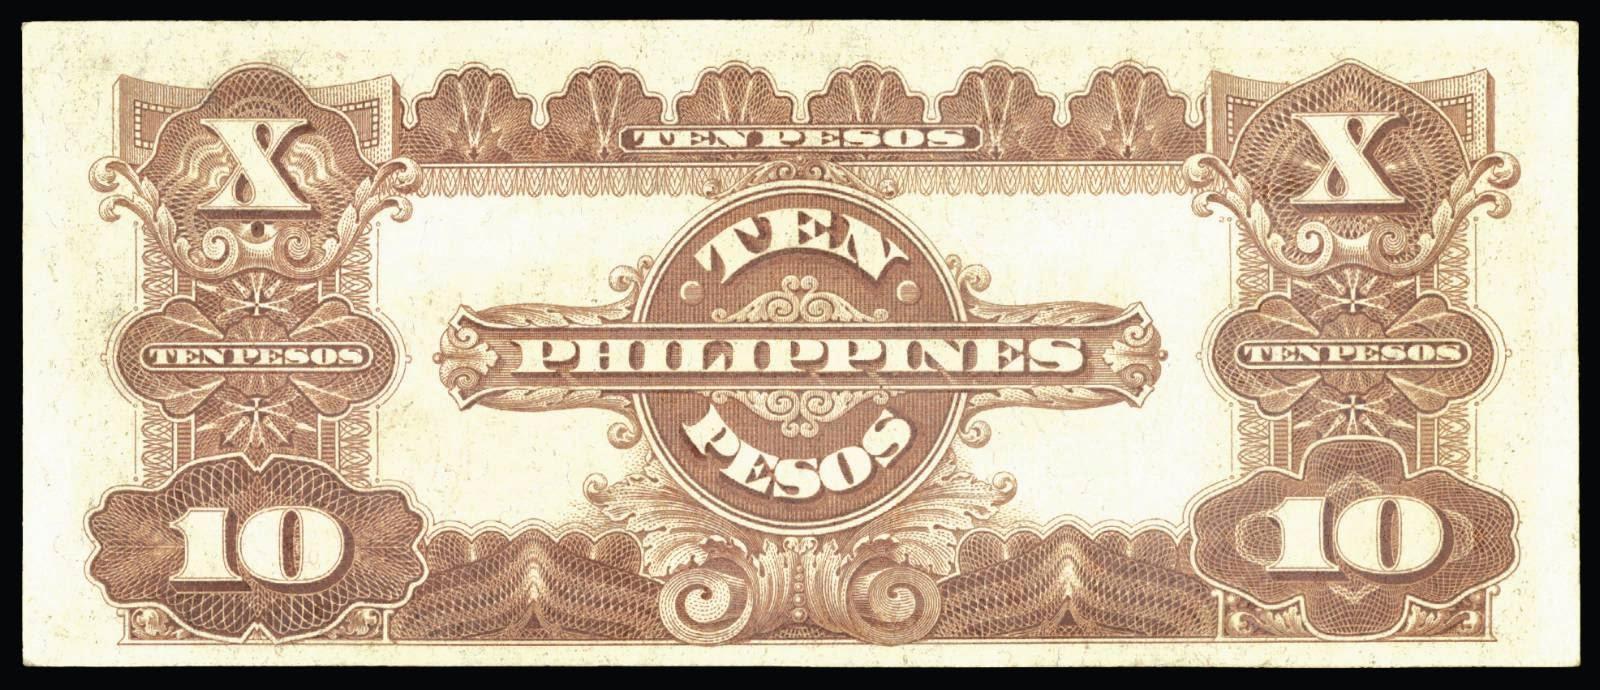 1941 Philippines Ten Pesos bank note Treasury Certificate